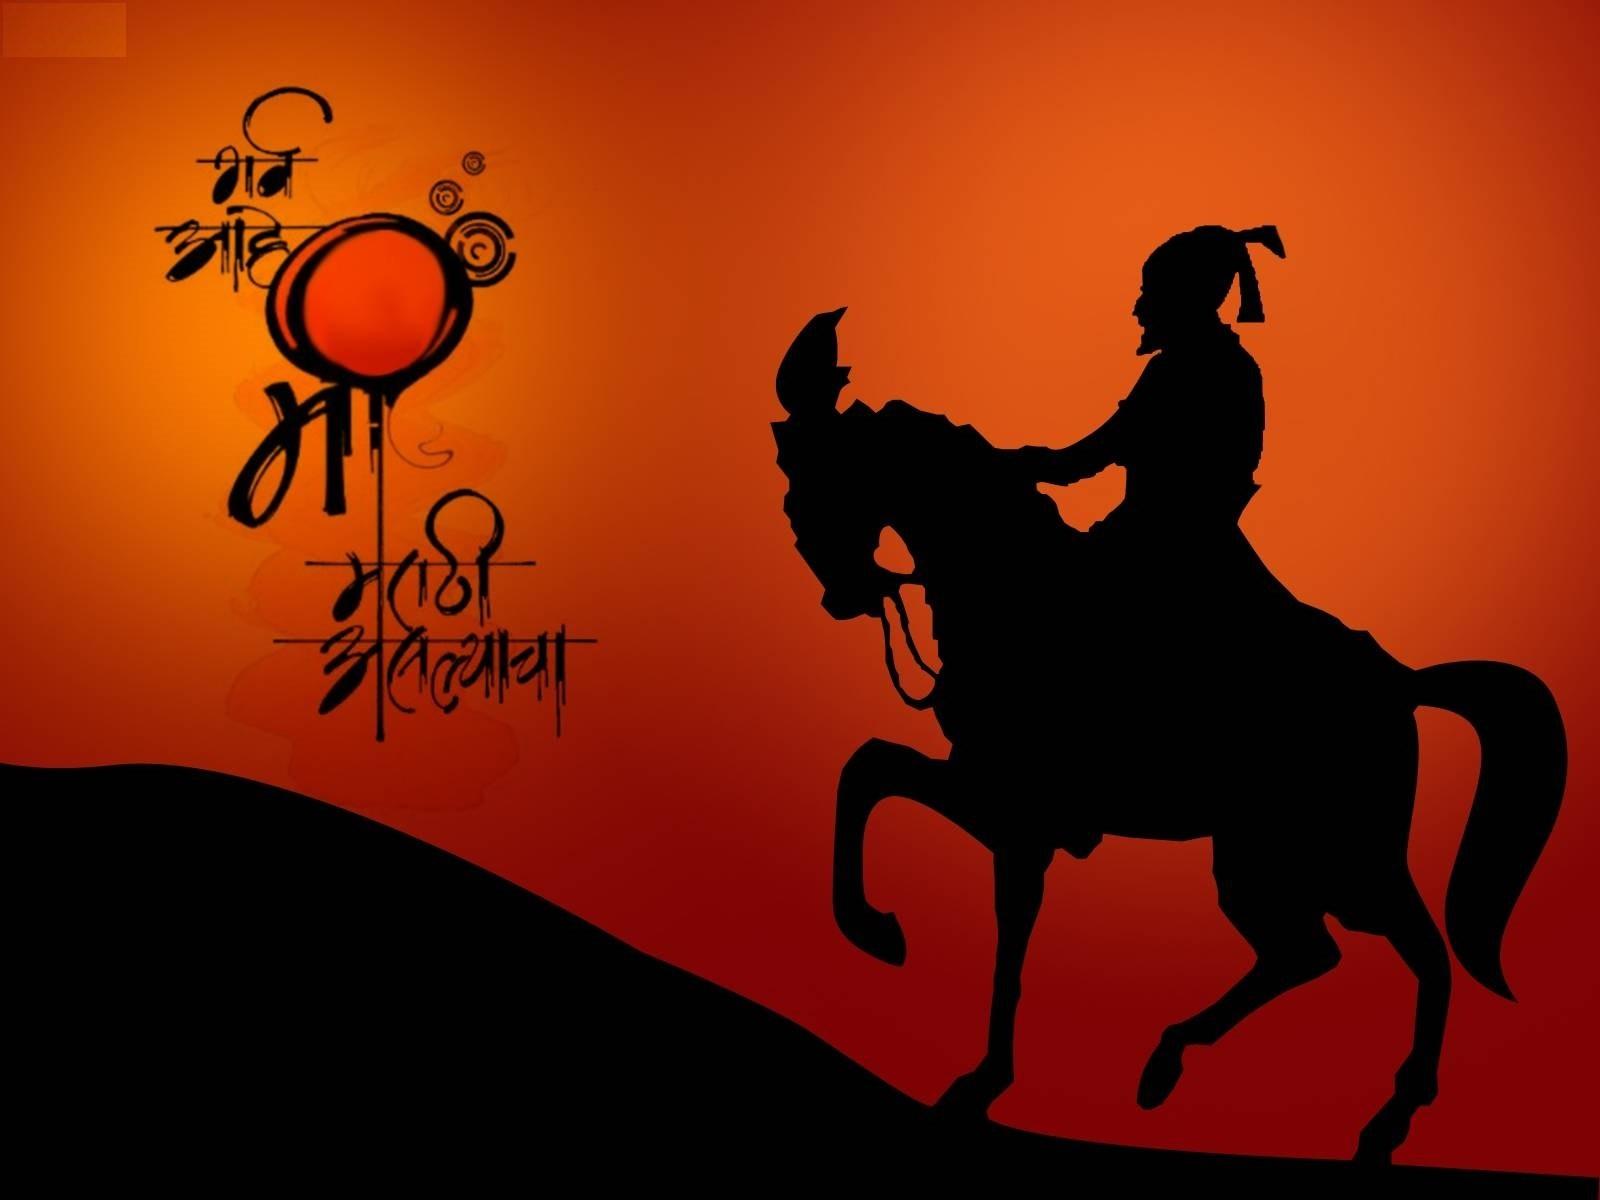 Me Marathi Image of Shivaji